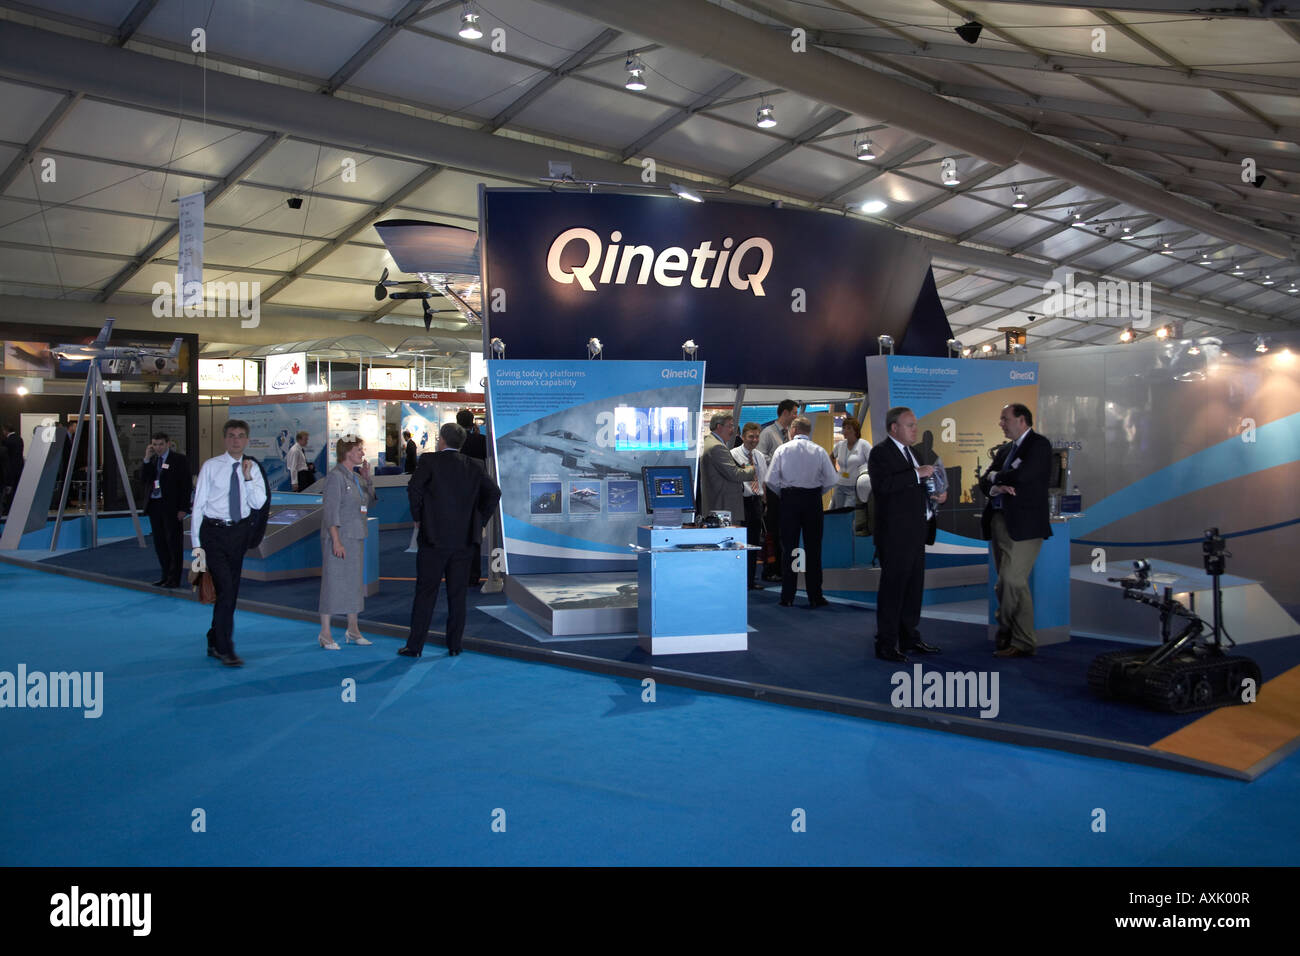 QinetiQ exhibition display trade stand at Farnborough International Airshow July 2006 - Stock Image